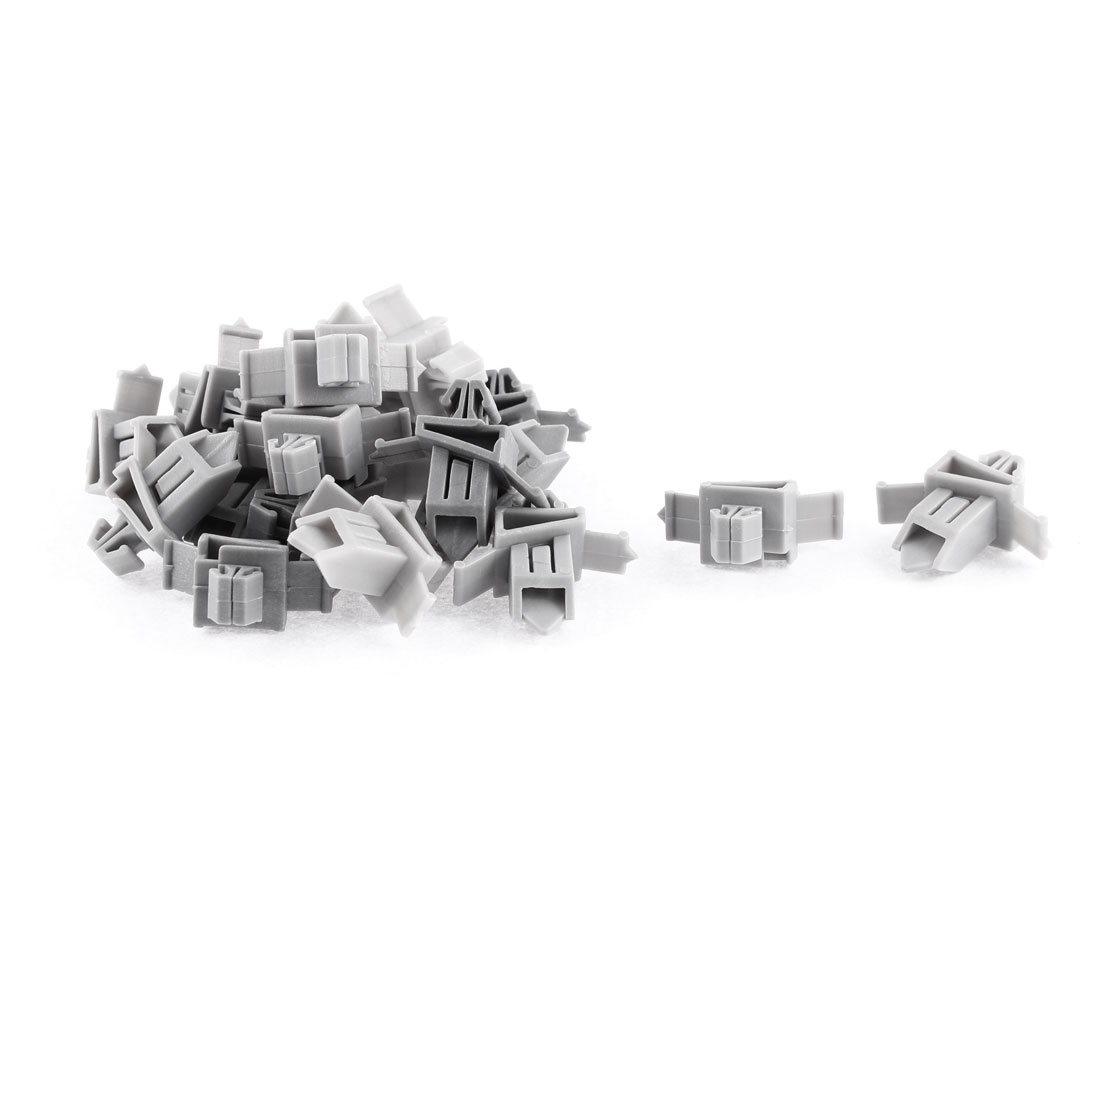 20 Pcs Gray Plastic Rivet Bumper Lining Trim Panel Retainer Fastener Clips for Toyota Prado